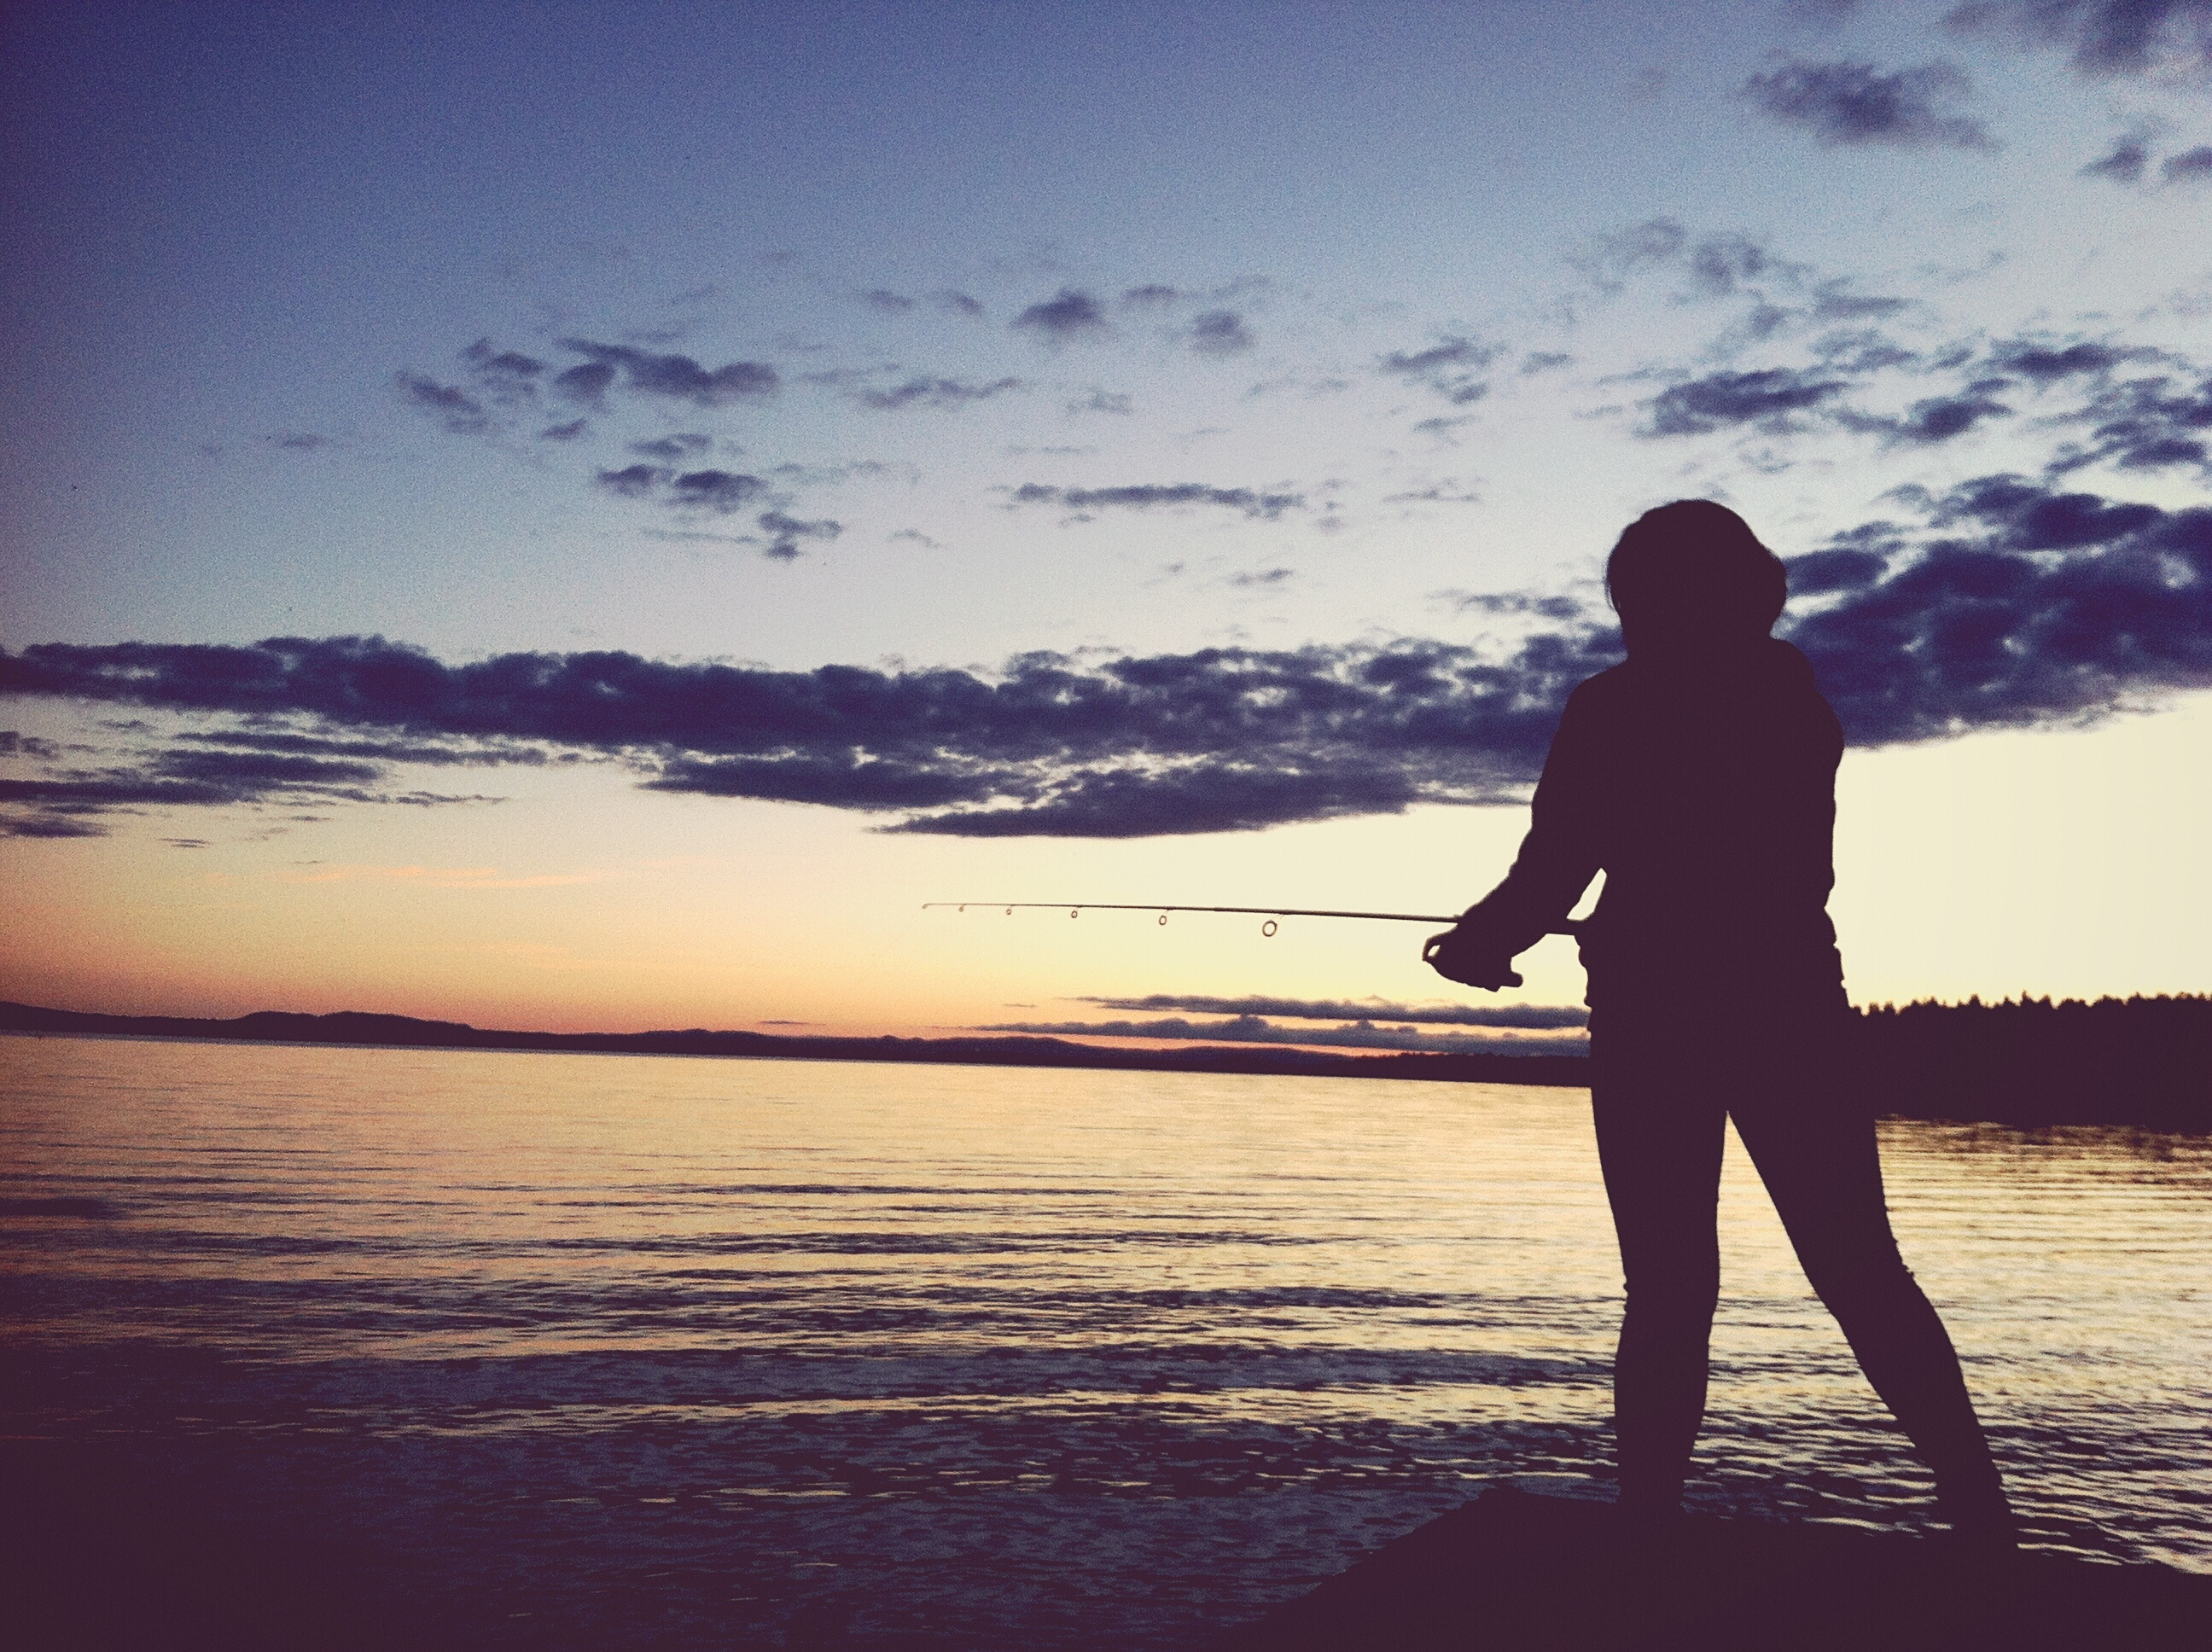 Nov 15 is Saskatchewan Hunting, Fishing & Trapping Heritage Day